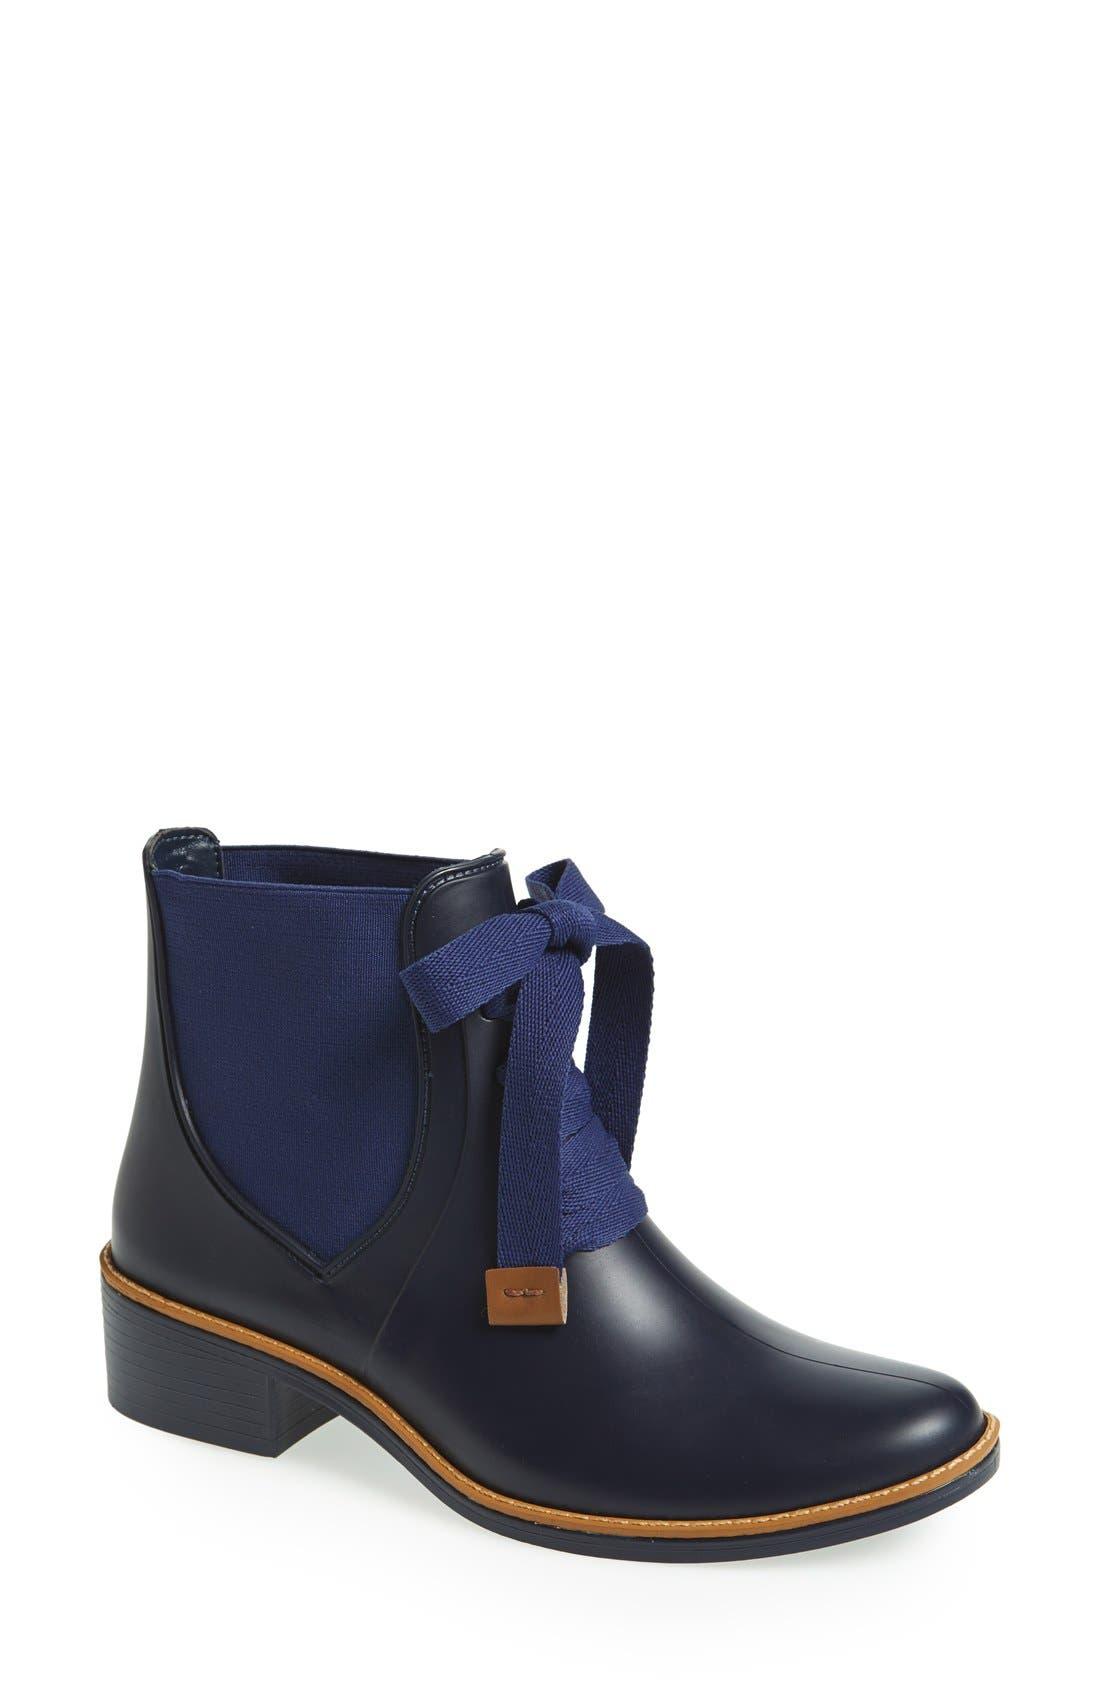 Bernardo Lacey Short Waterproof Rain Boot,                         Main,                         color, Navy